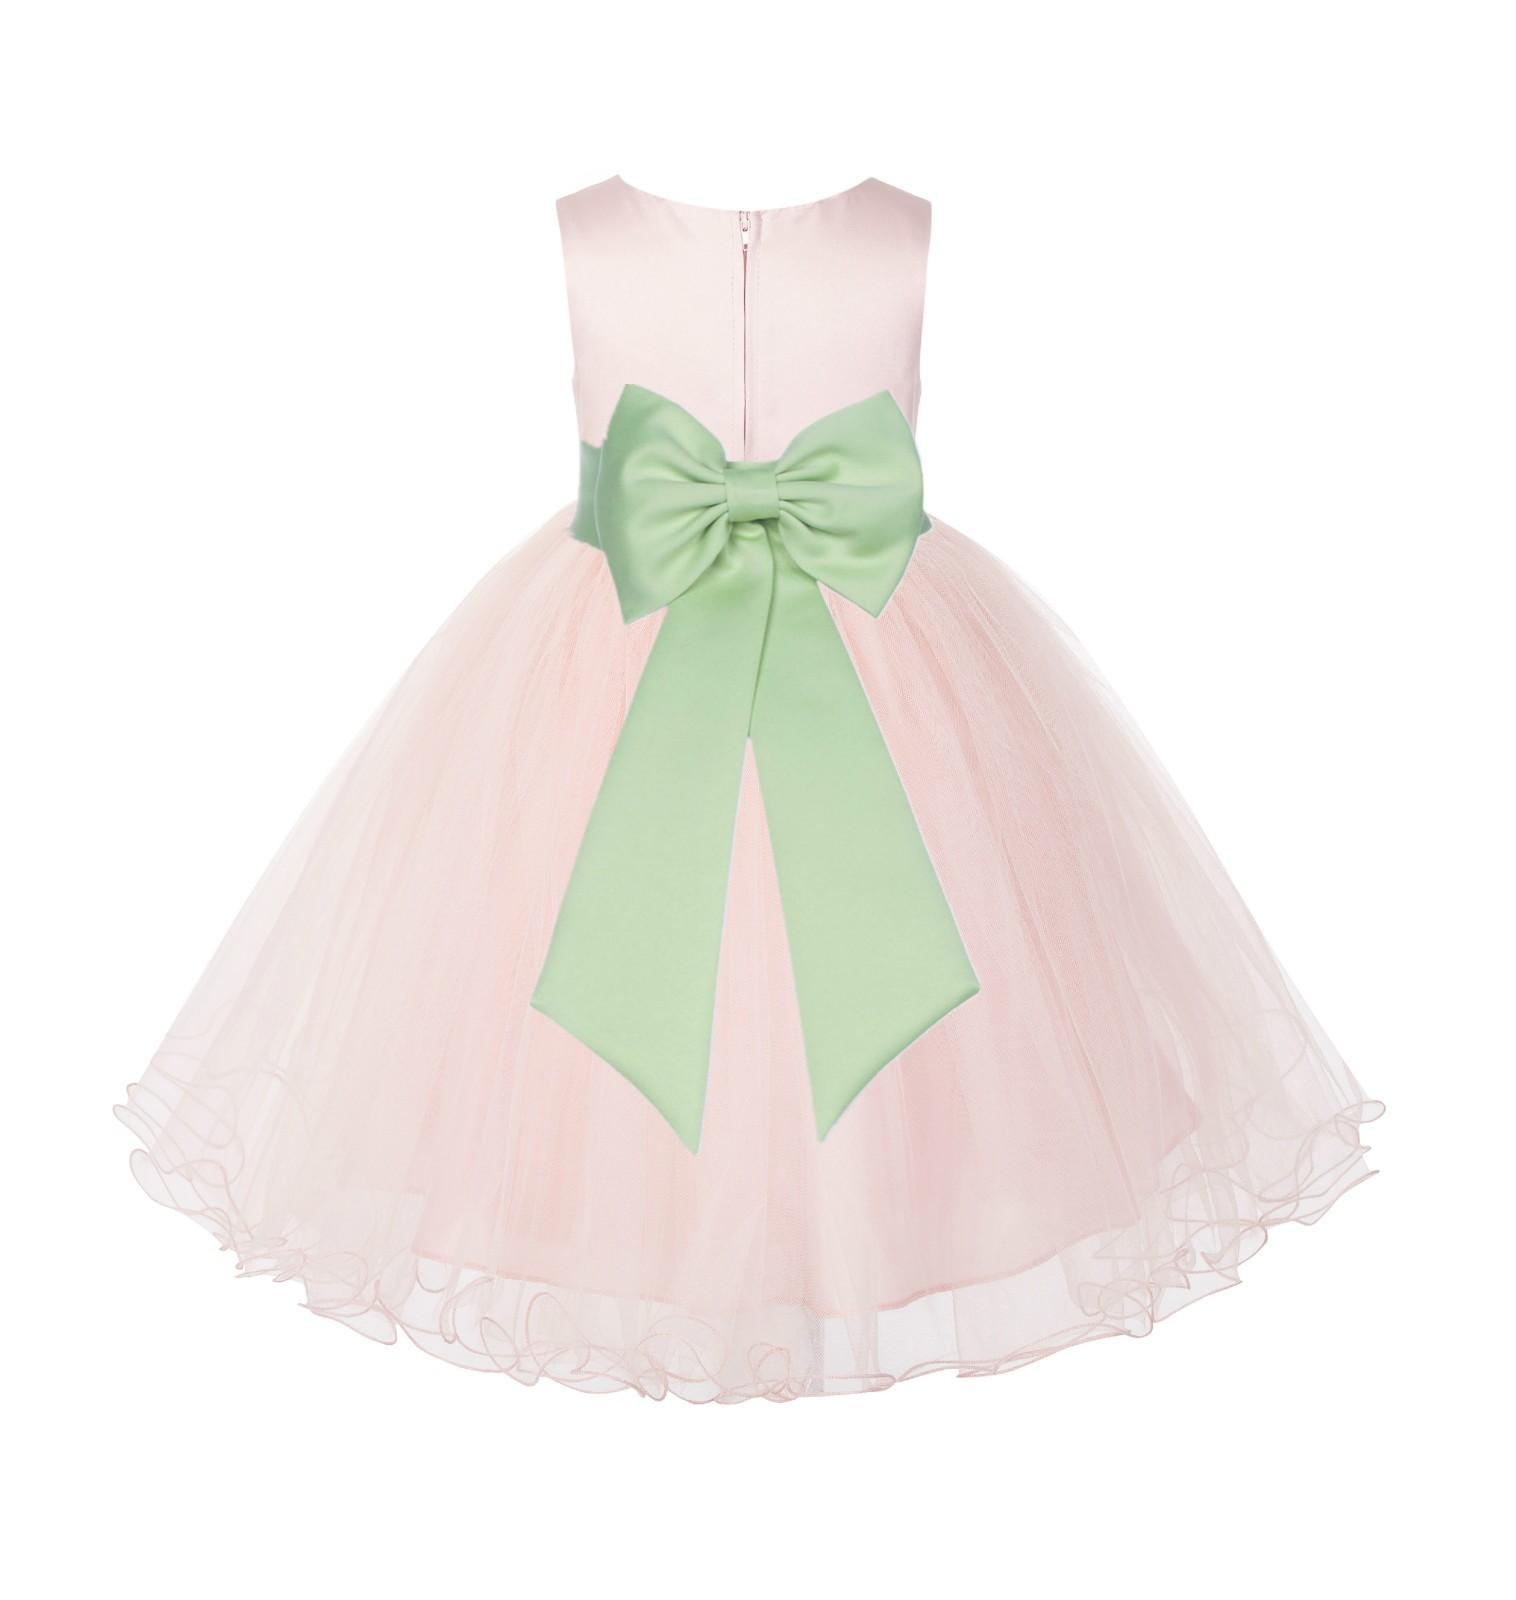 Blush PInk / Apple Green Tulle Rattail Edge Flower Girl Dress Wedding Bridesmaid 829T